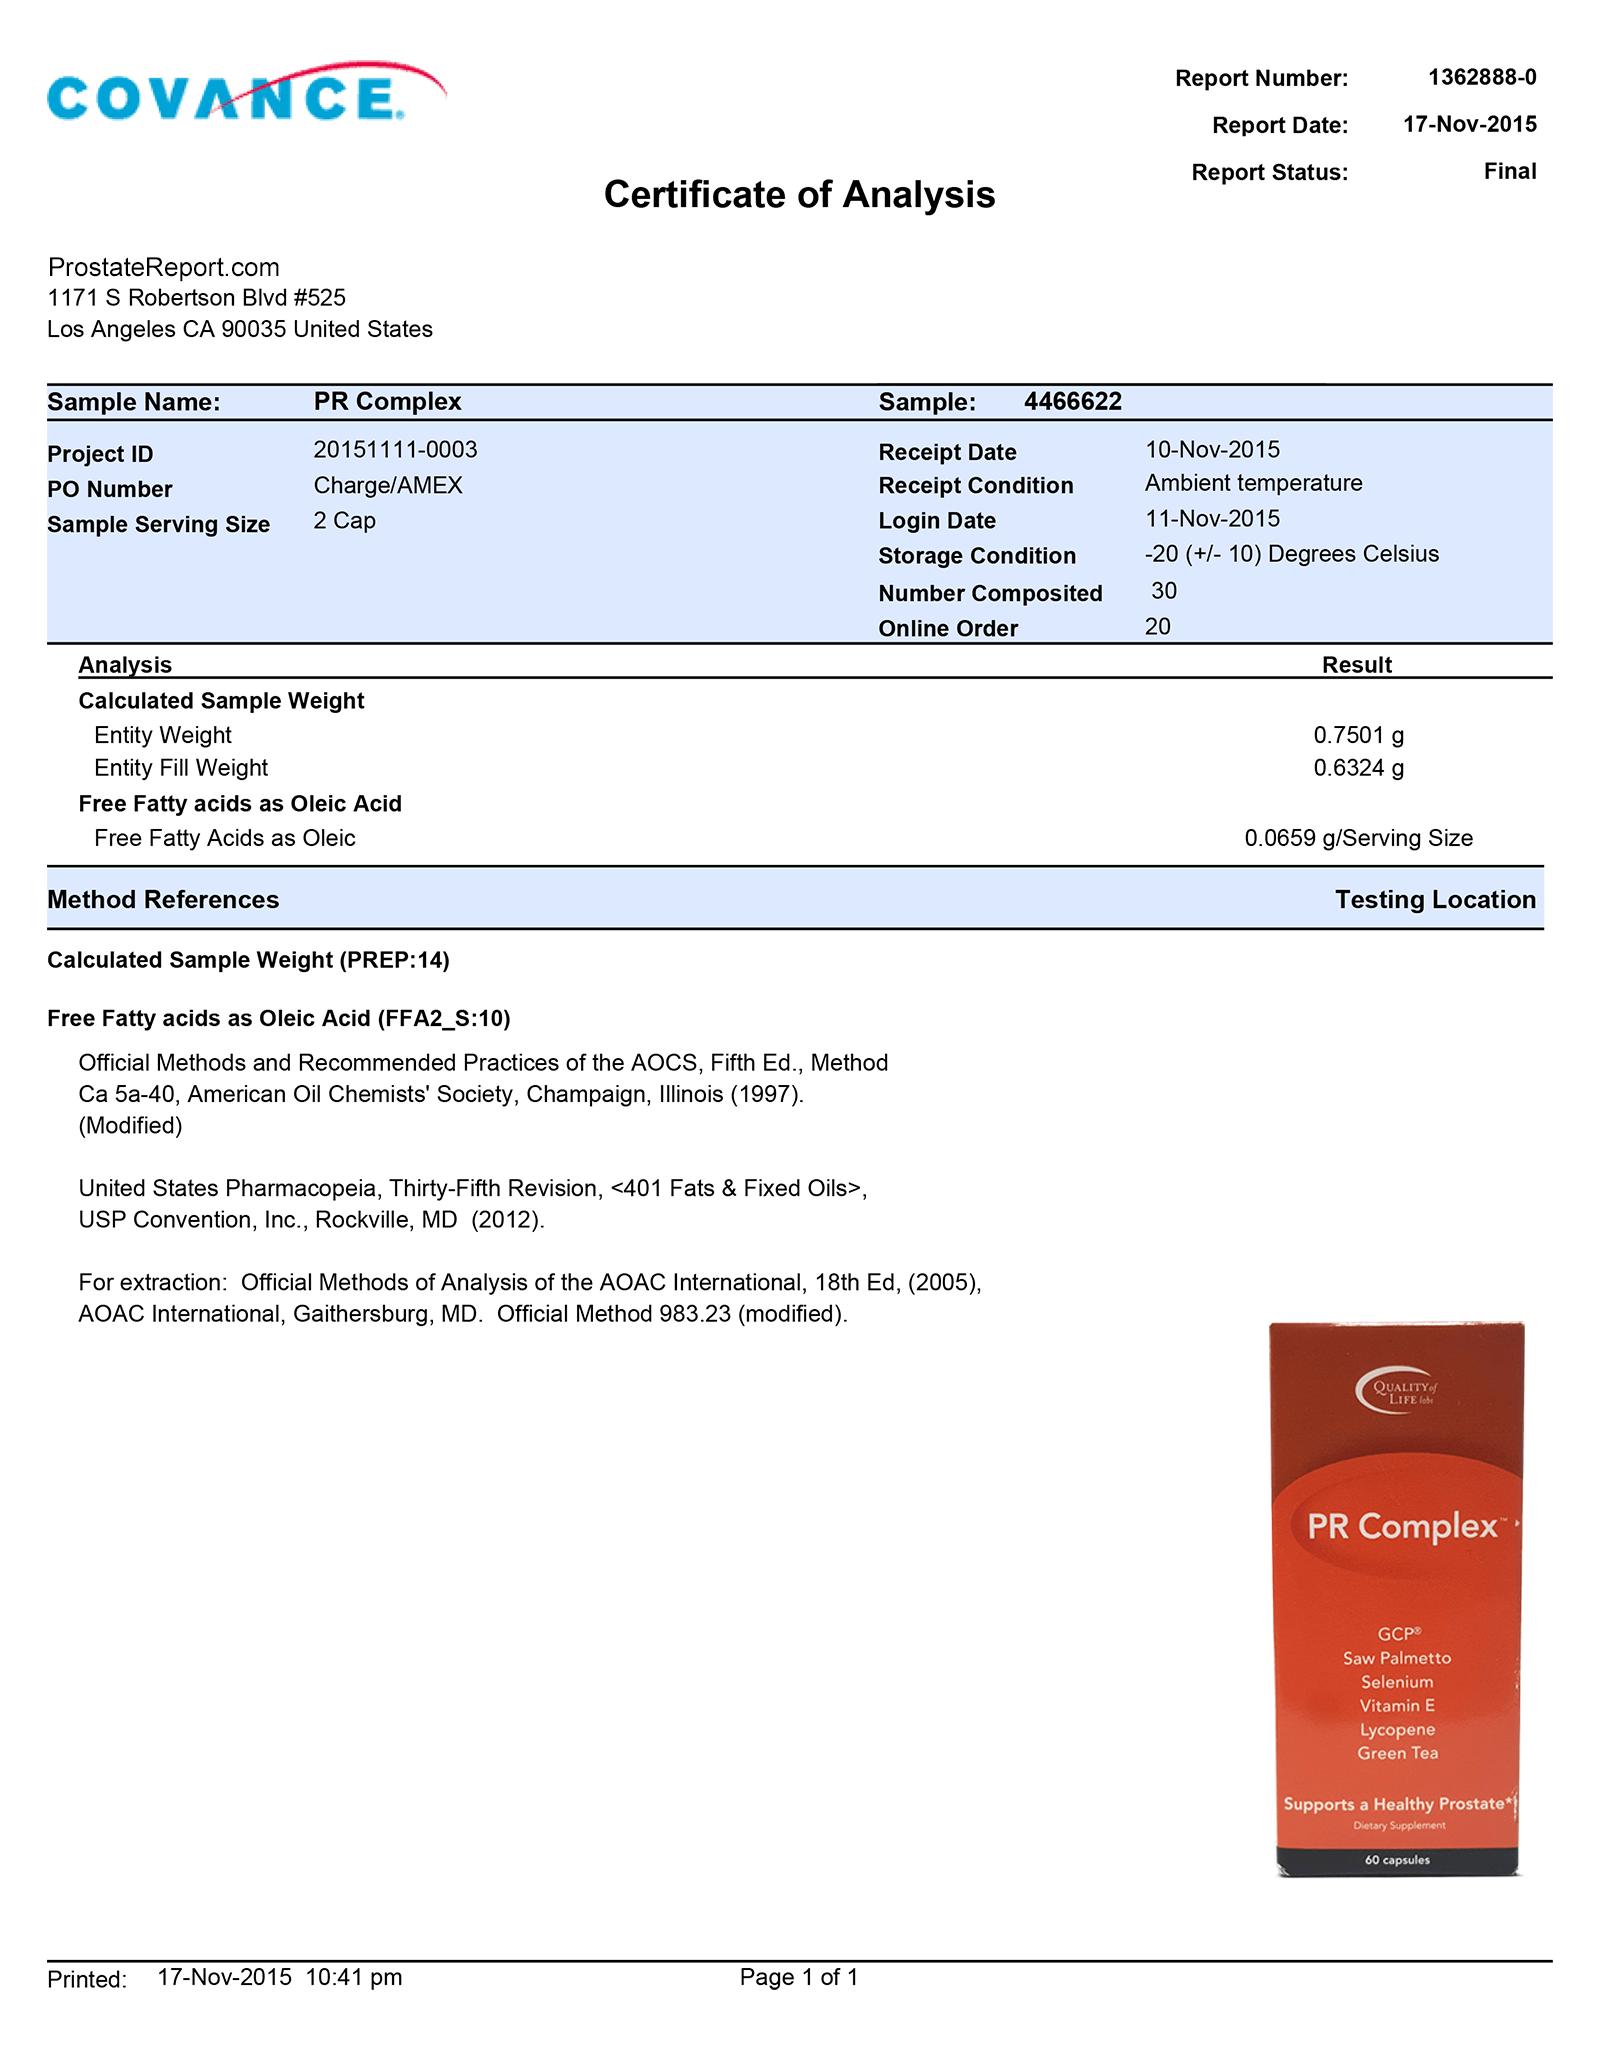 PR Complex lab report